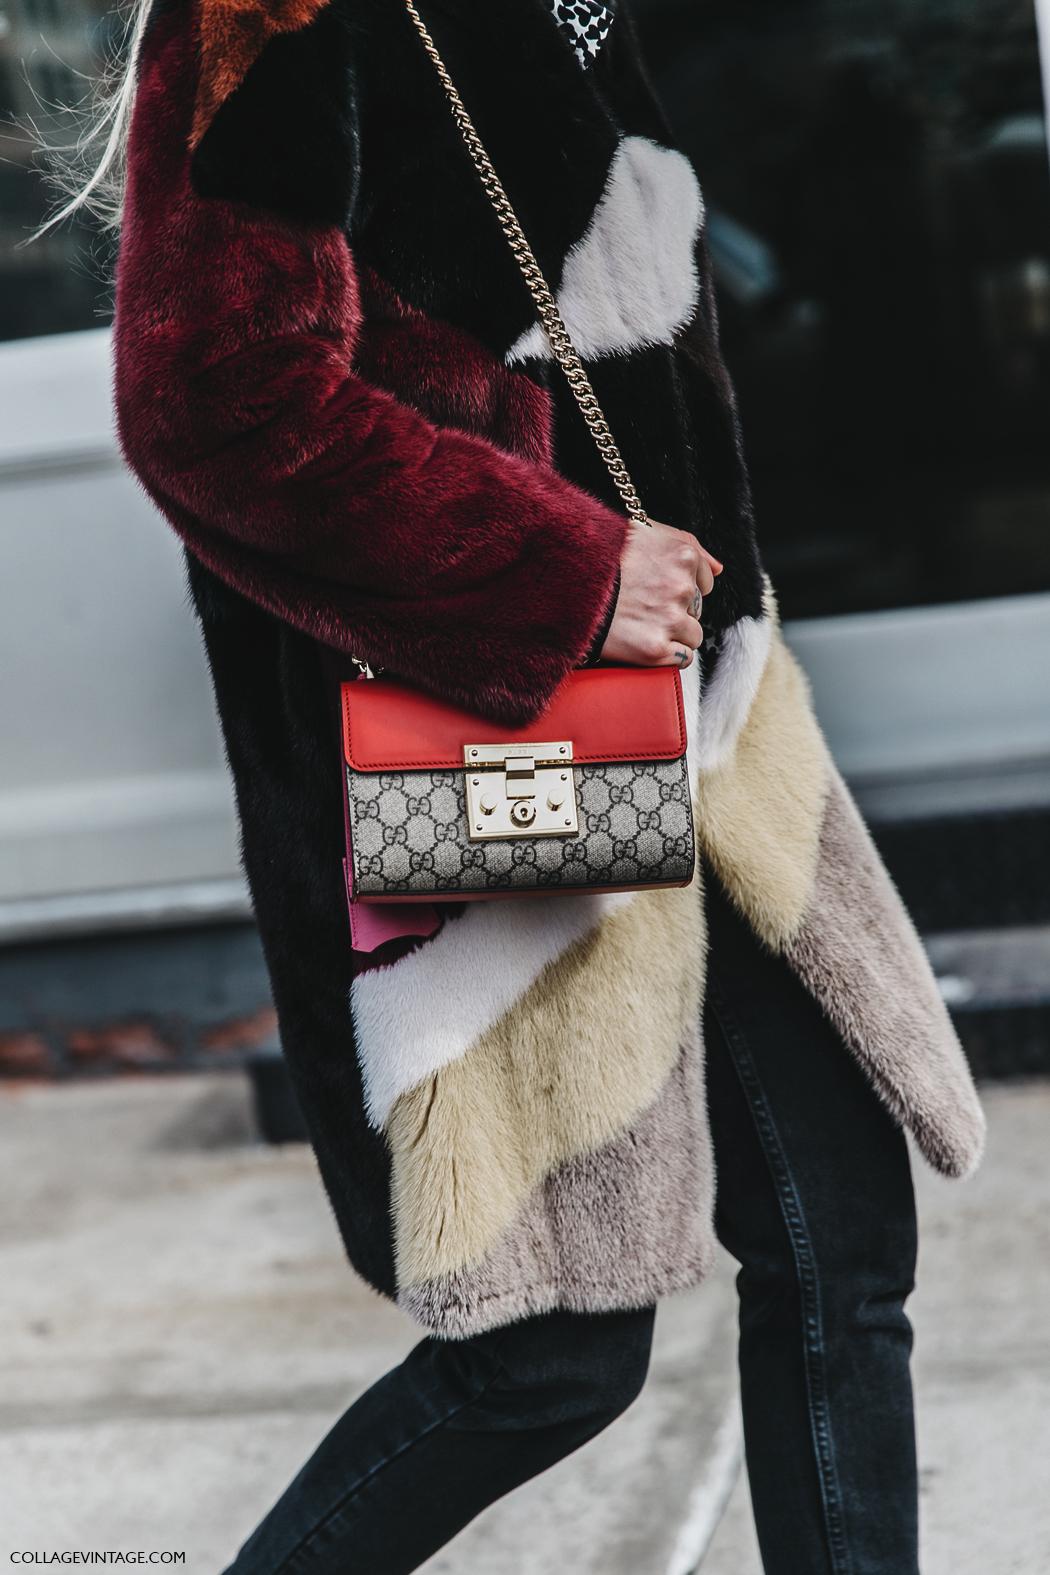 NYFW-New_York_Fashion_Week-Fall_Winter-17-Street_Style-Gucci_Bag-Fur_Coat-